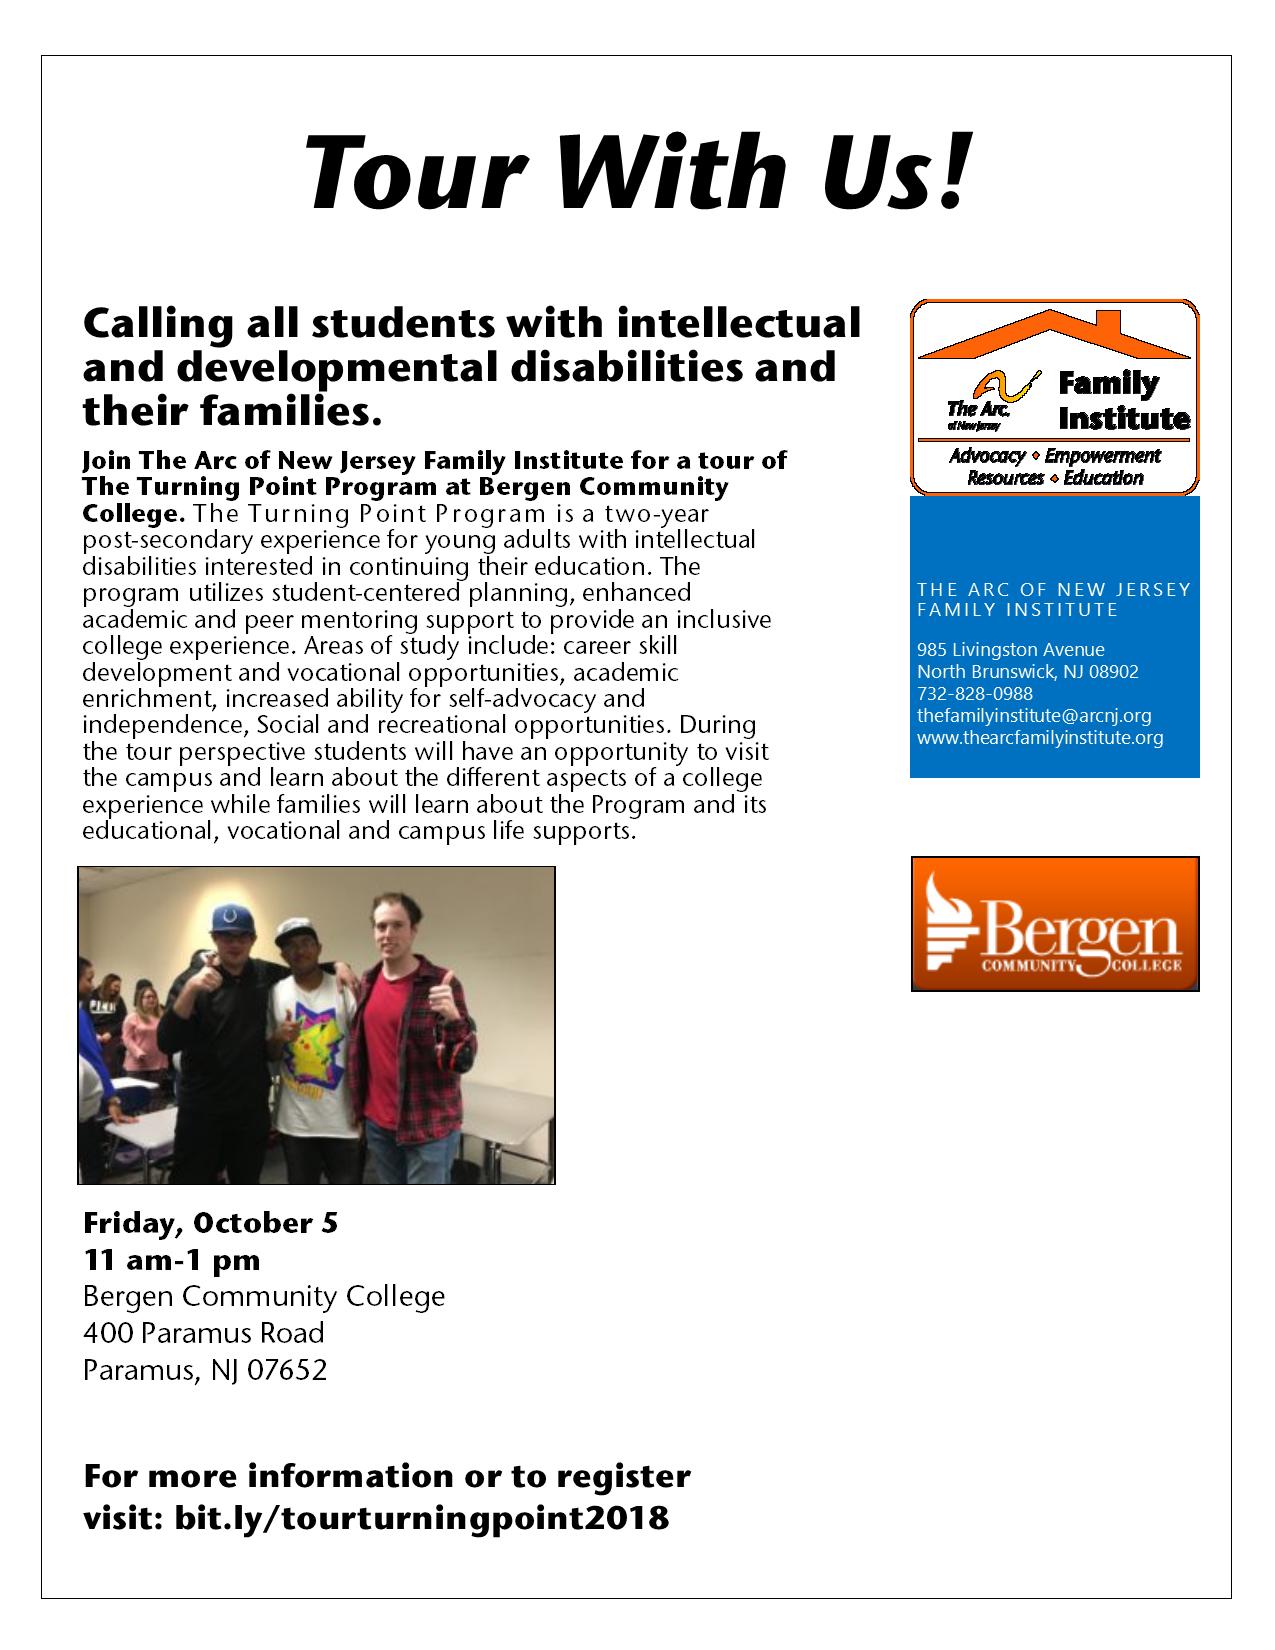 Turning Point Program at Bergen Community College Tour